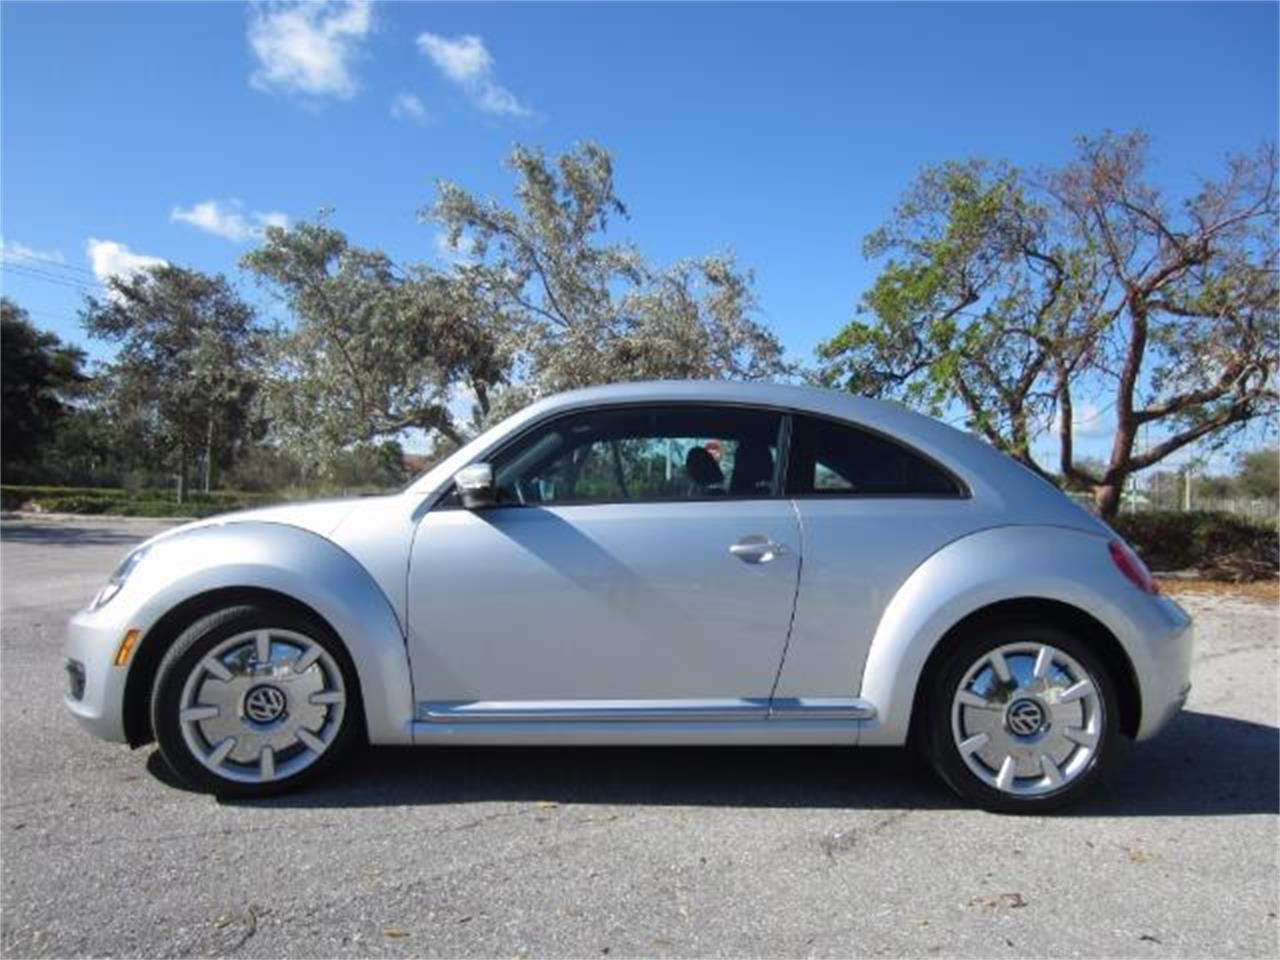 2012 Volkswagen Beetle For Sale Classiccars Com Cc 1026664